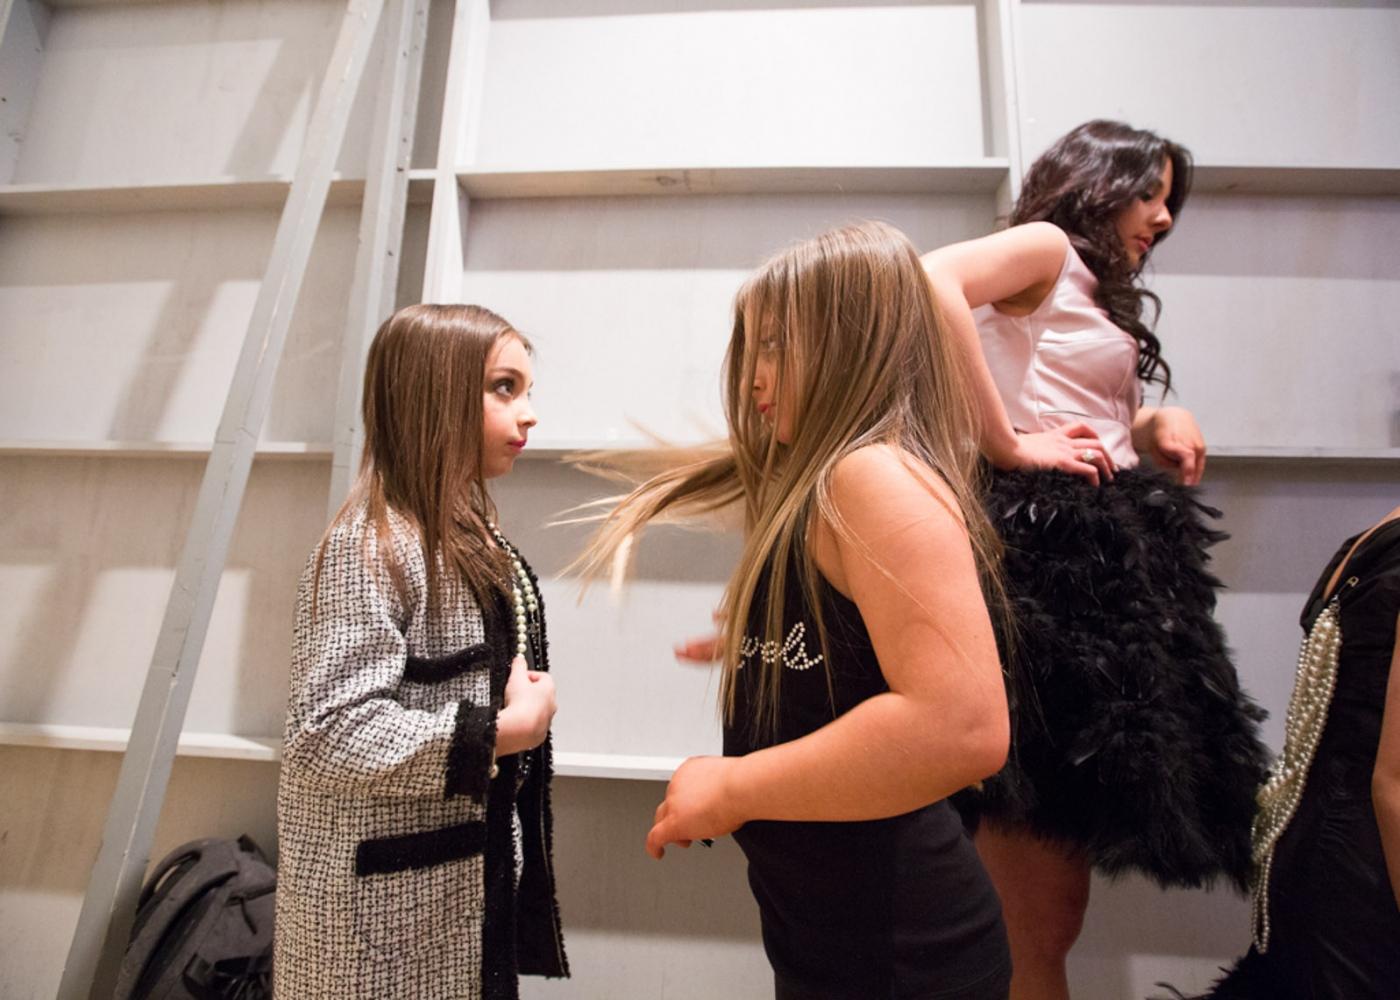 Isabella backstage at New York Fashion Week For Nido Magazine